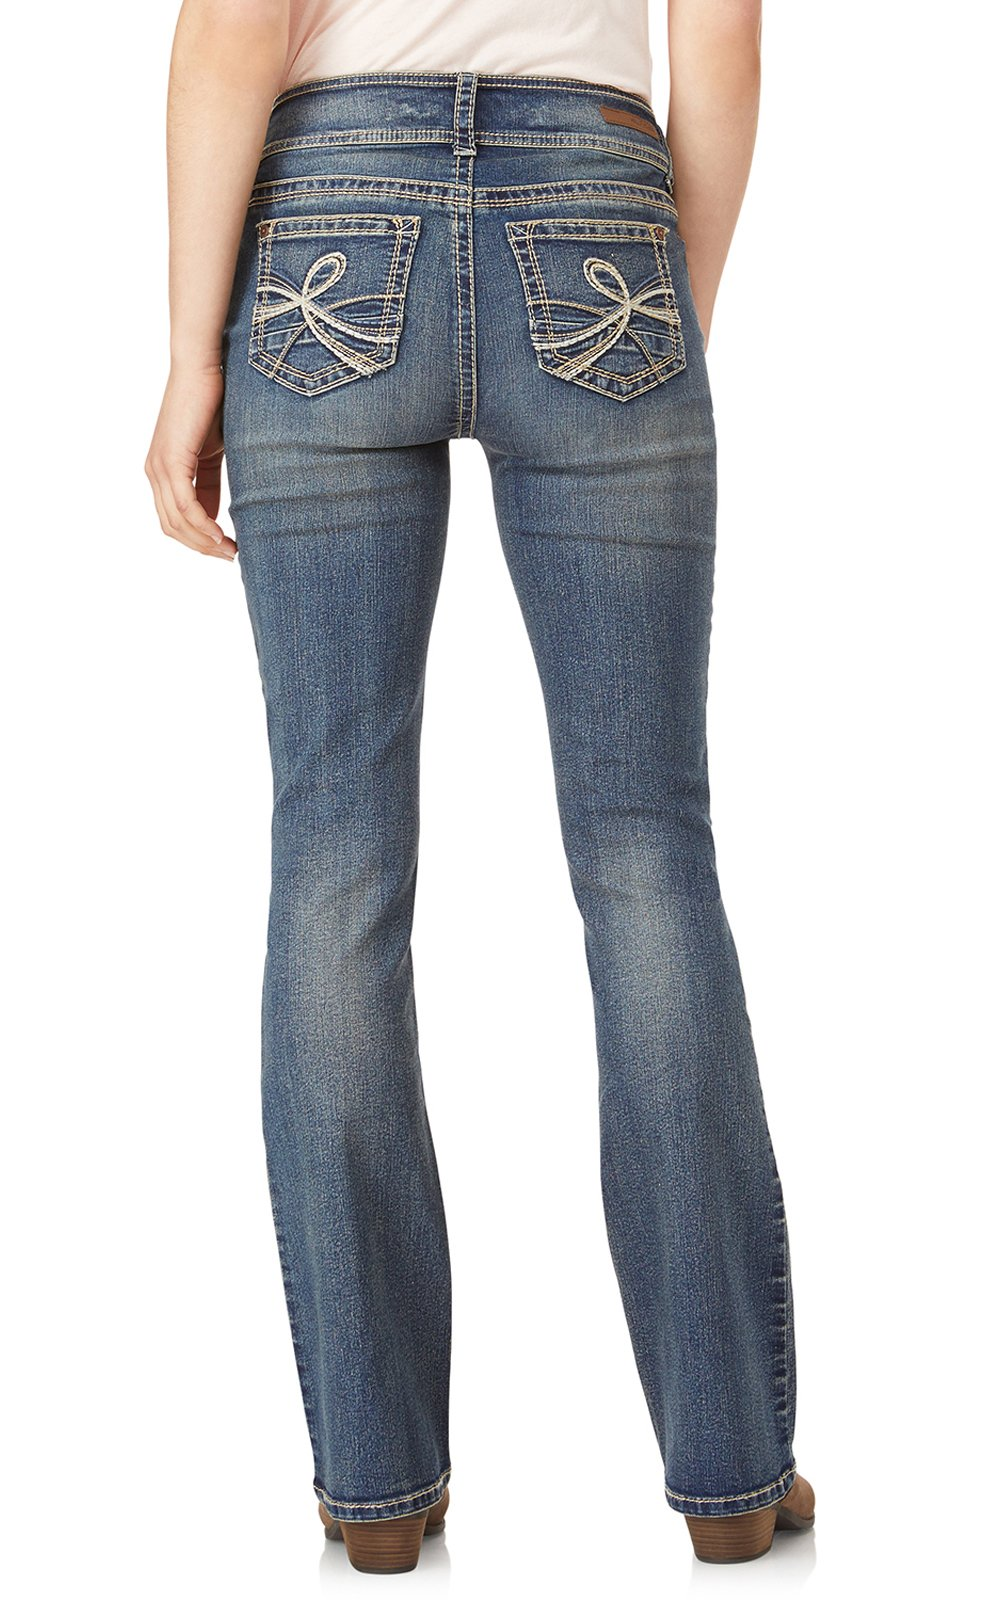 WallFlower Jeans Junior's Petite InstaStretch Luscious Curvy Bootcut, Basil, 3 Short by WallFlower (Image #2)